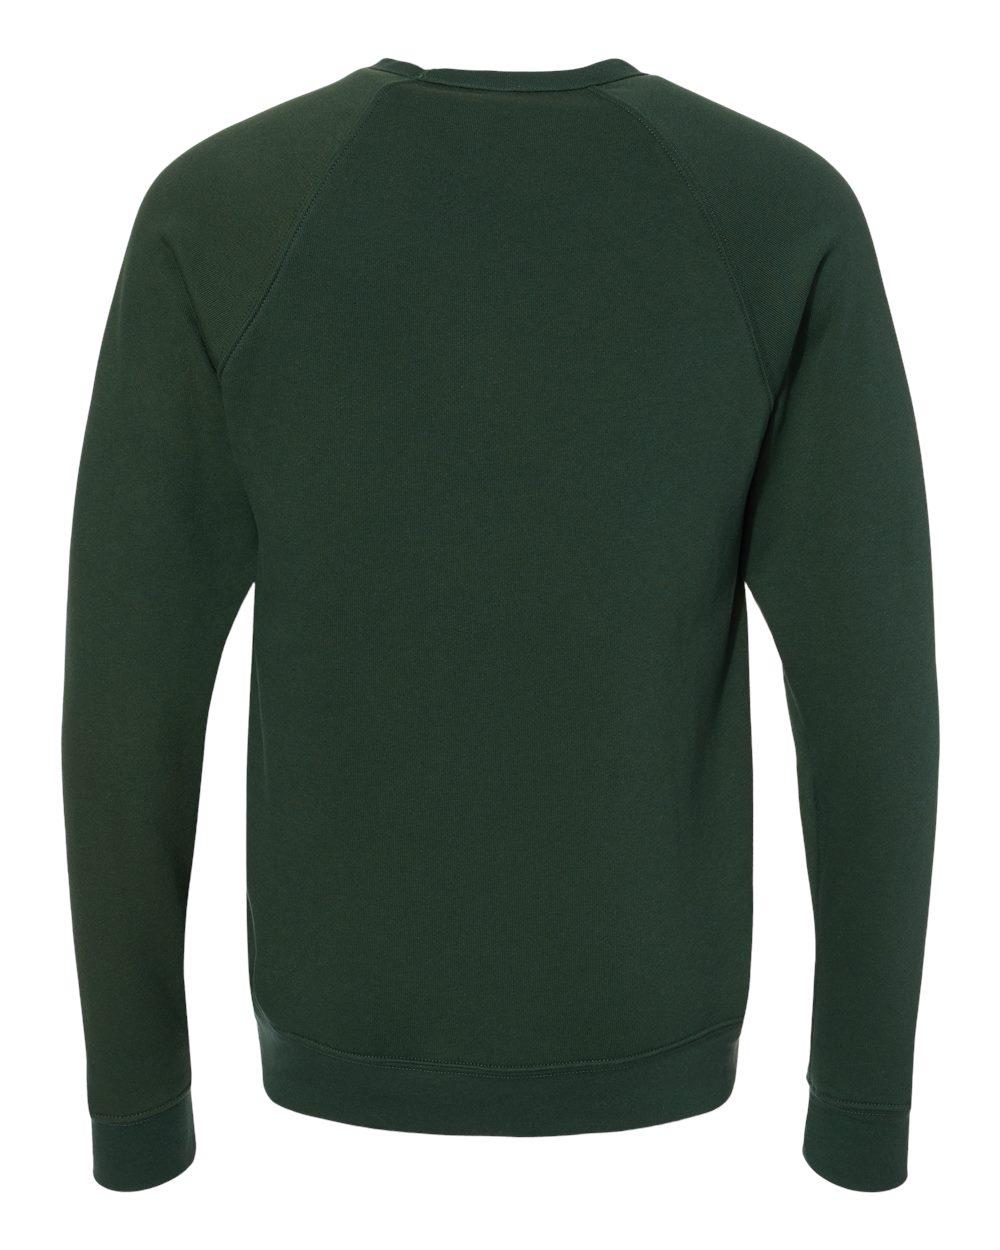 Bella-Canvas-Unisex-Sponge-Fleece-Crewneck-Sweatshirt-Top-Blank-3901-up-to-2XL thumbnail 27